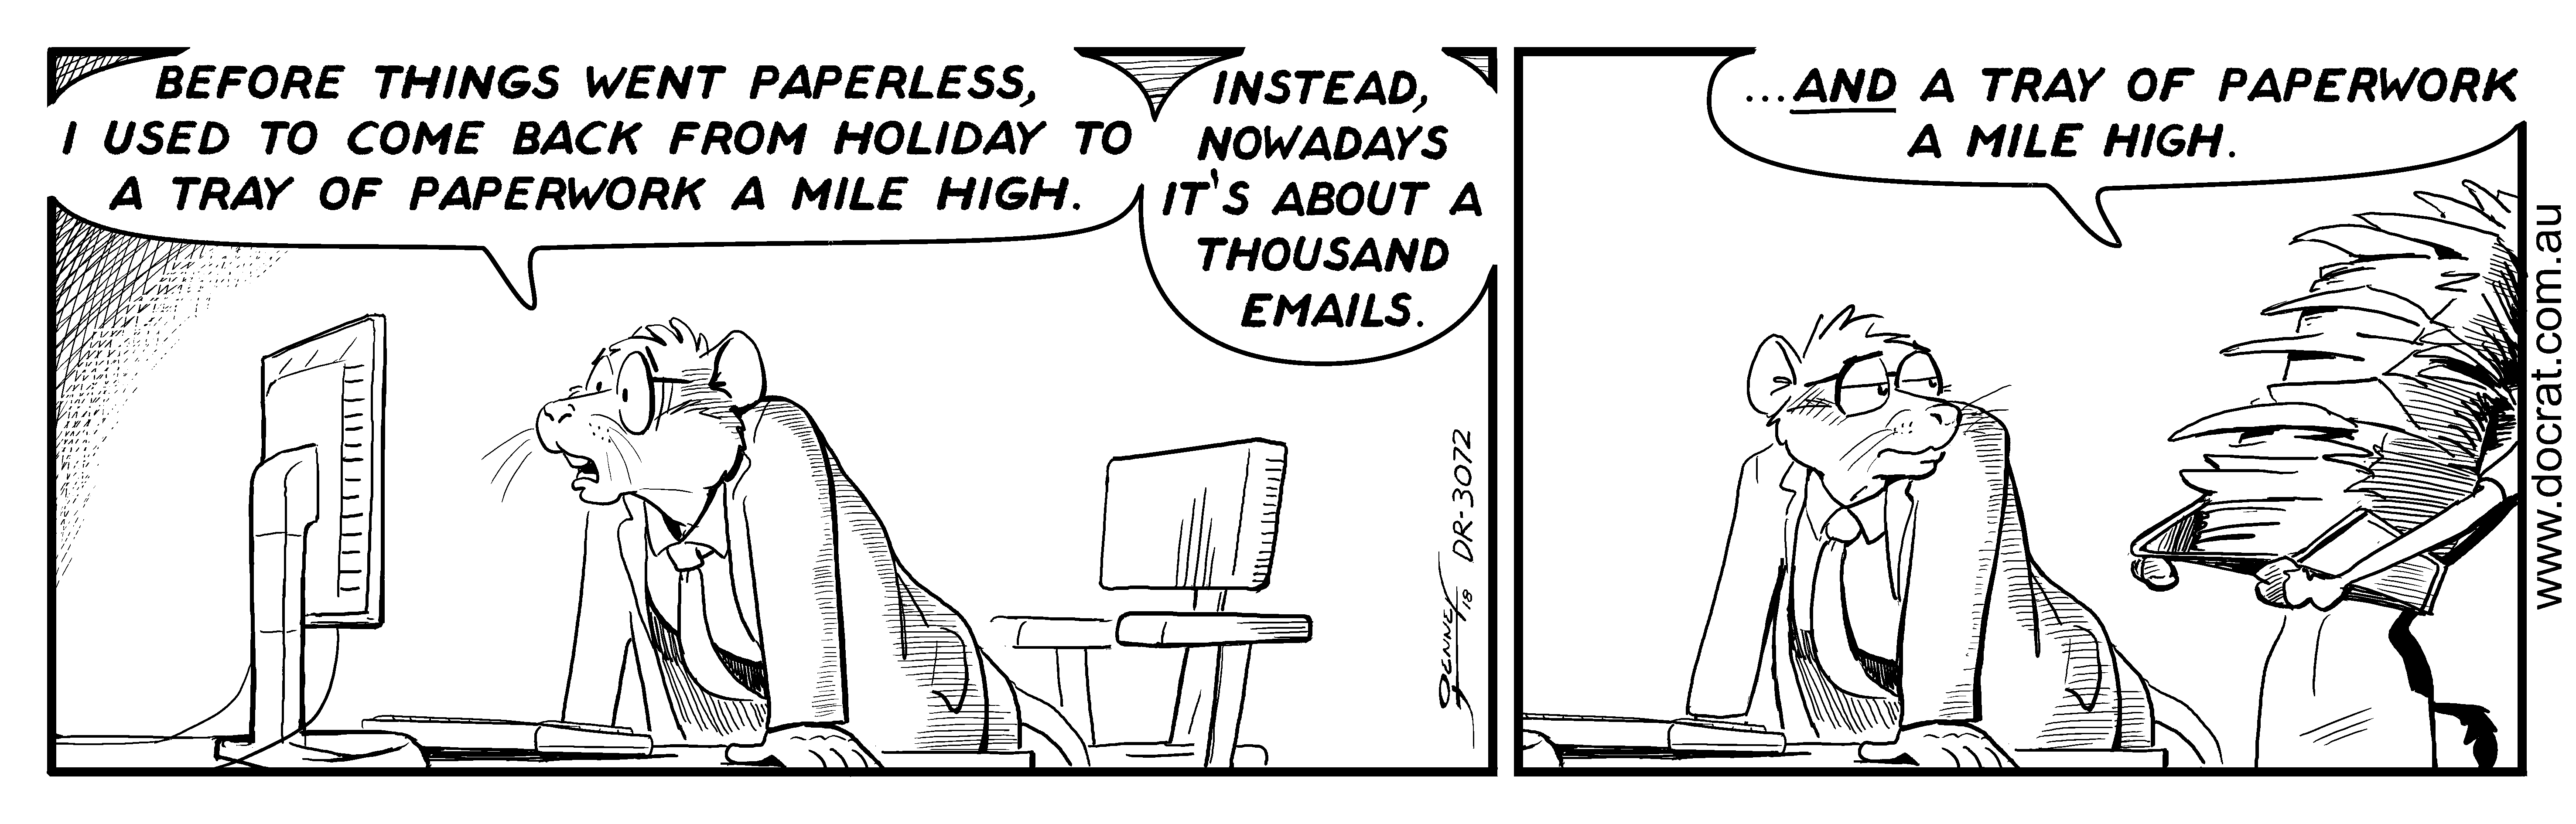 20180918